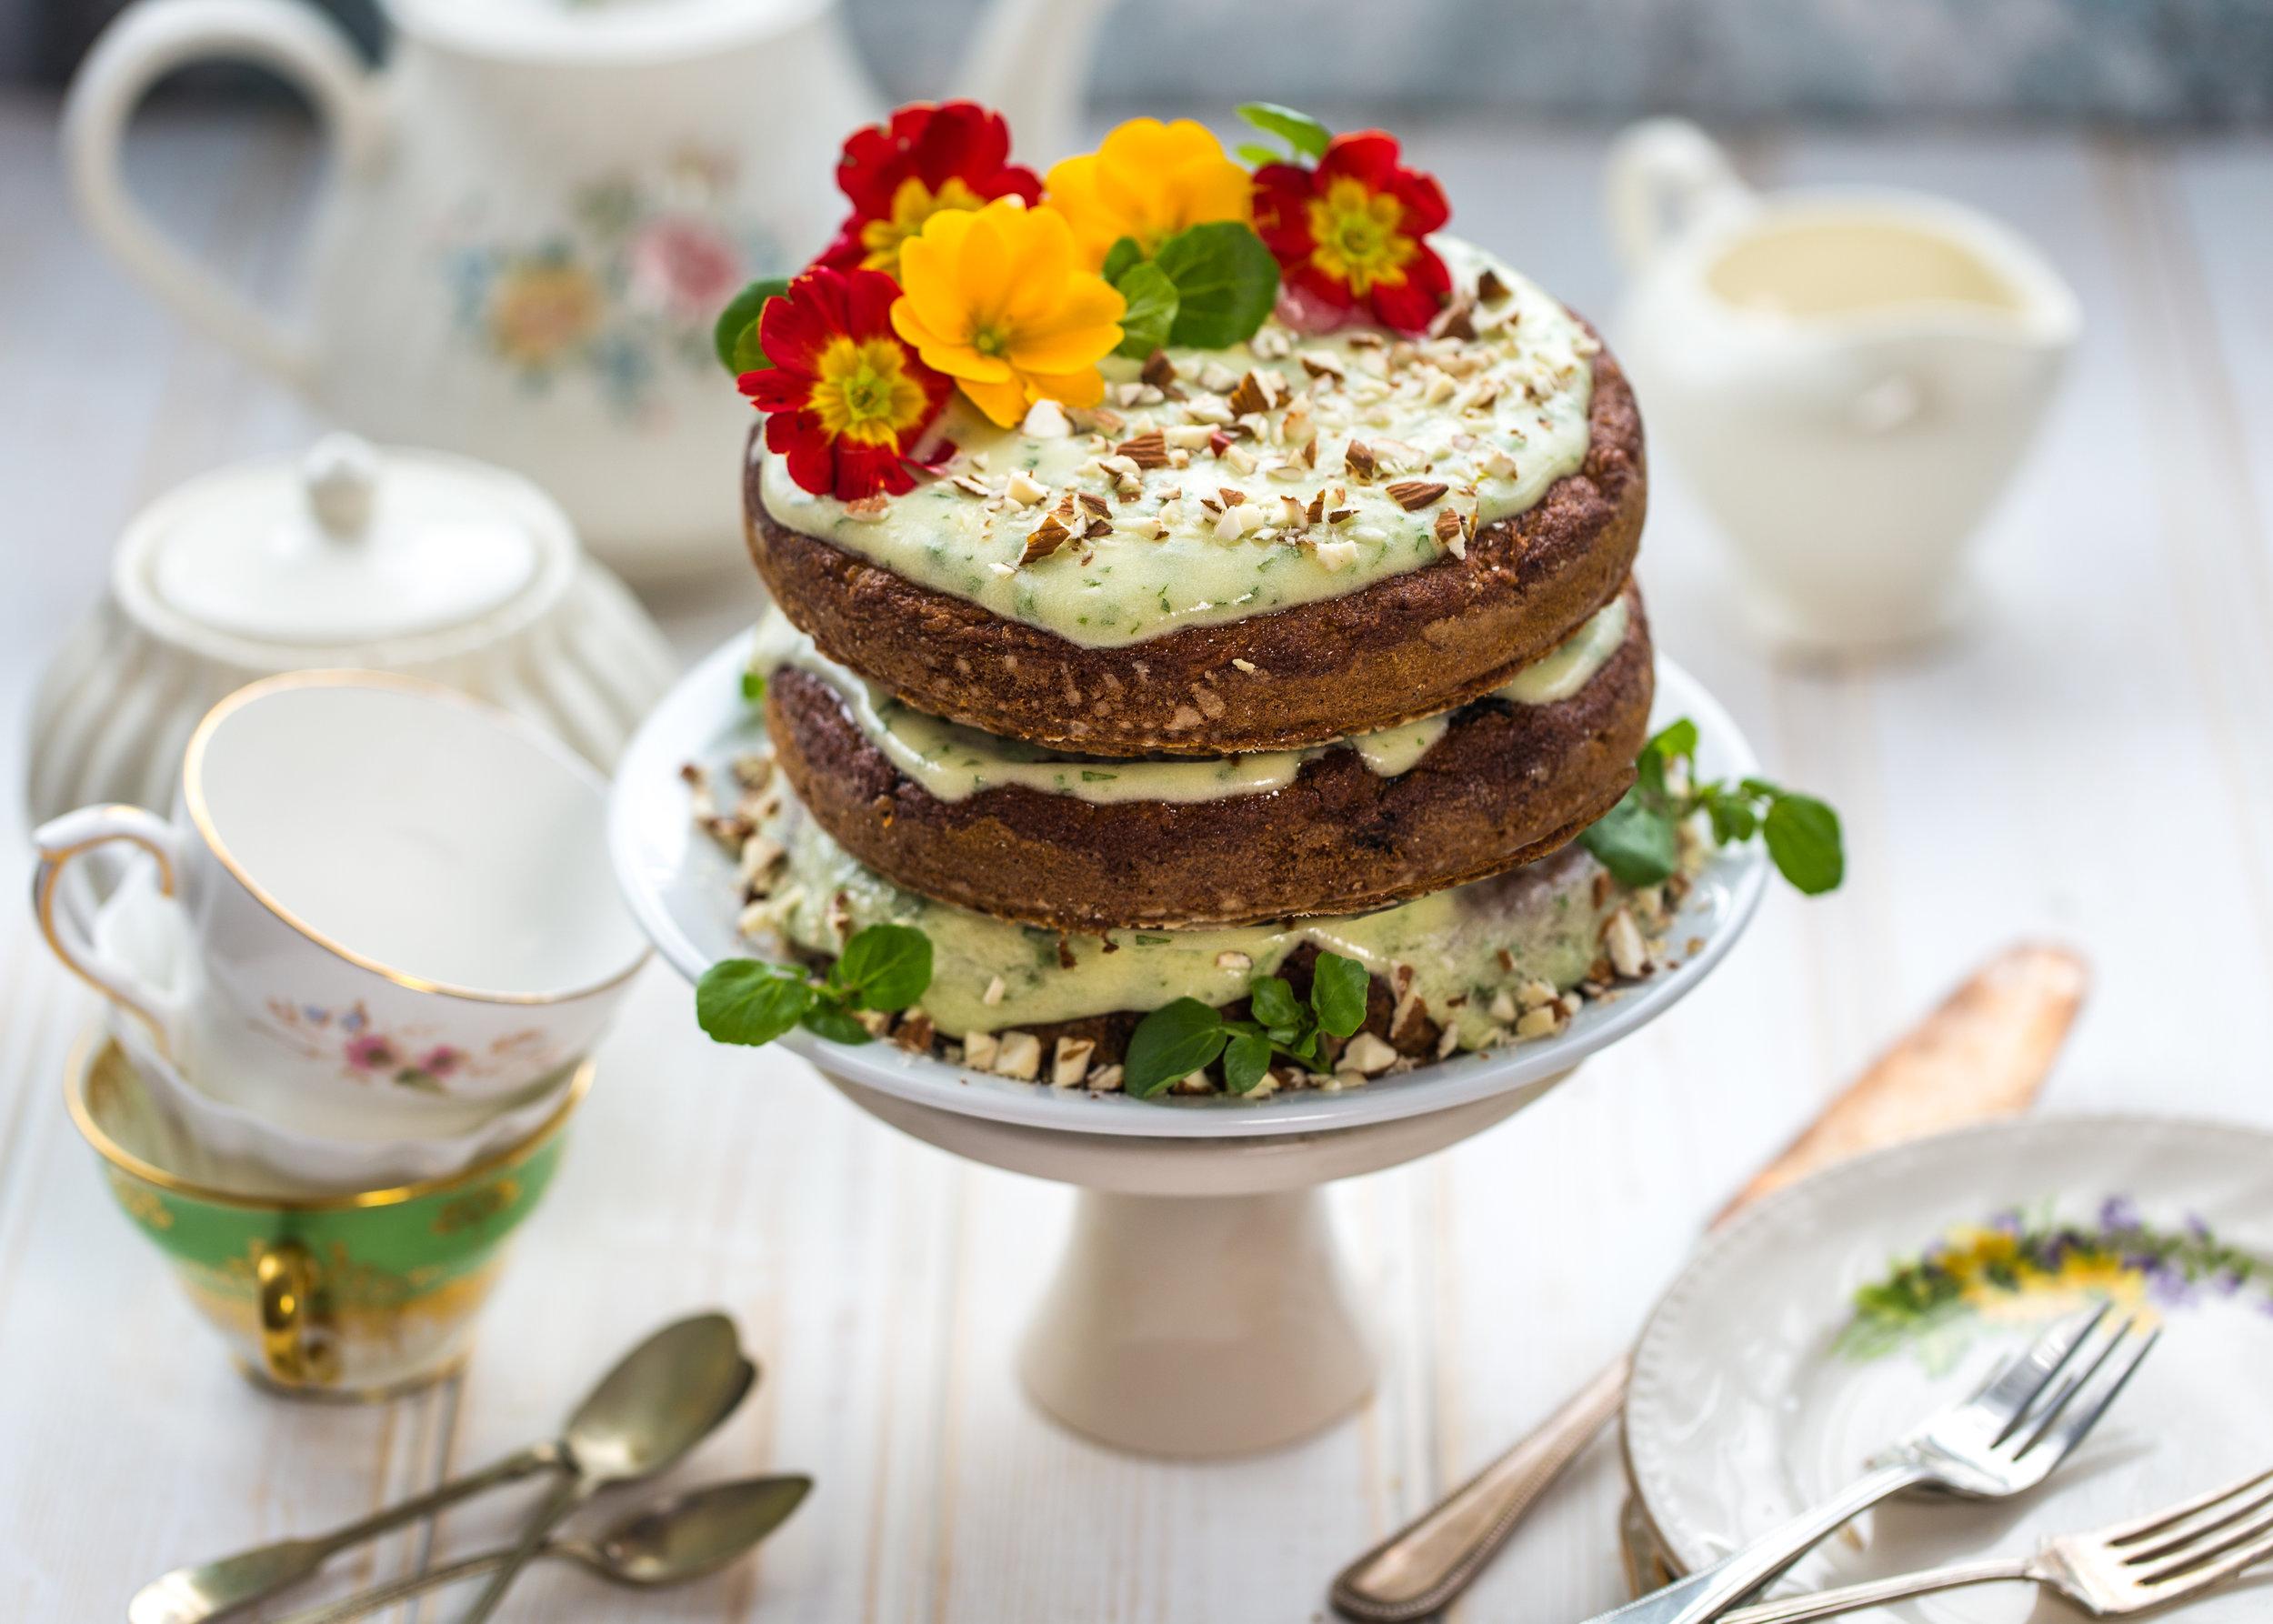 Watercress carrot cake vegan mothers day afternoon tea landcsape.jpg